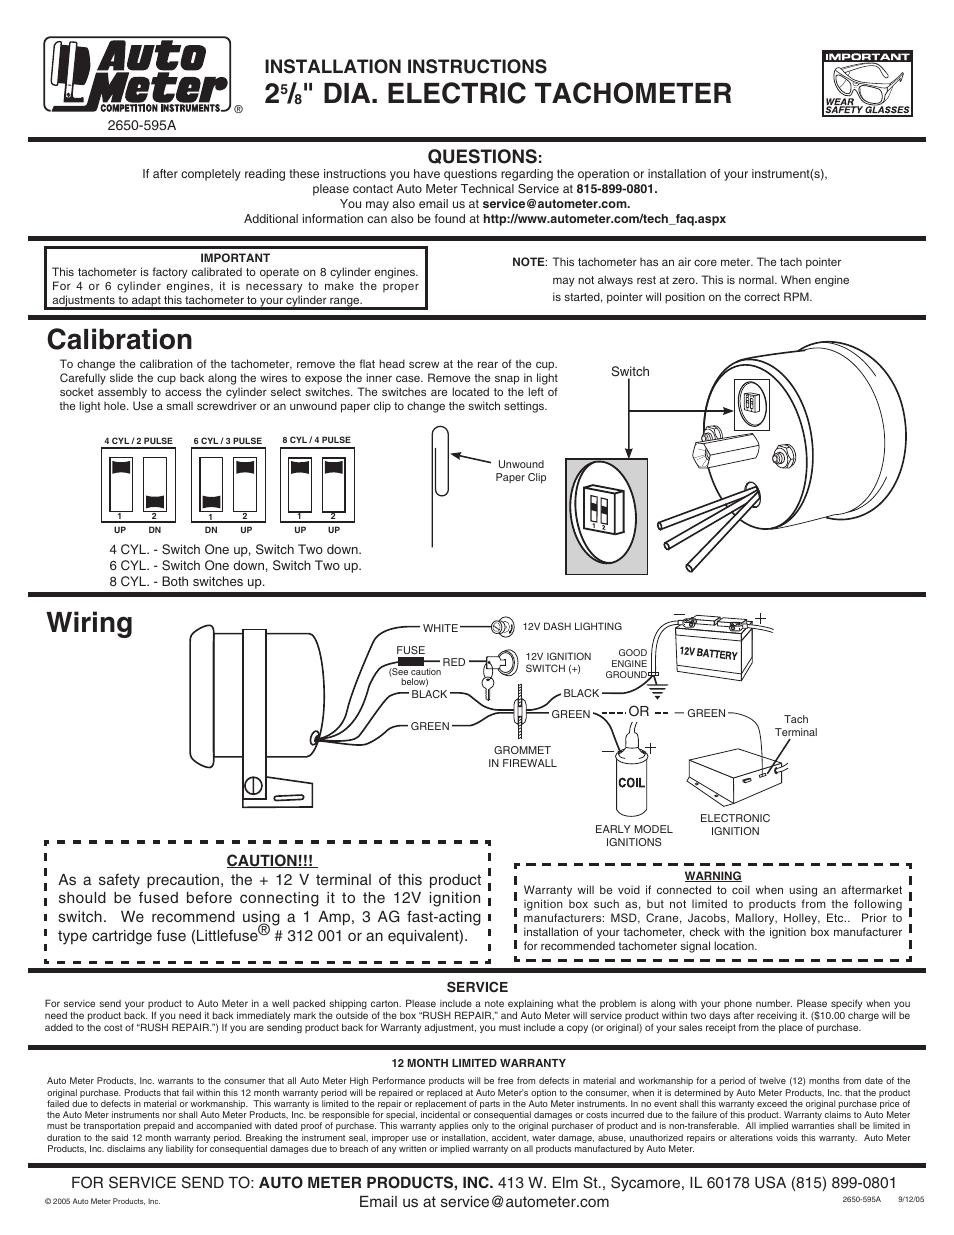 Vdo Tach Wiring 4 Cylinder ~ Wiring Diagram Portal ~ \\u2022 6 Volt System Diagram Vdo Tachometer Wiring Diagram Chevy